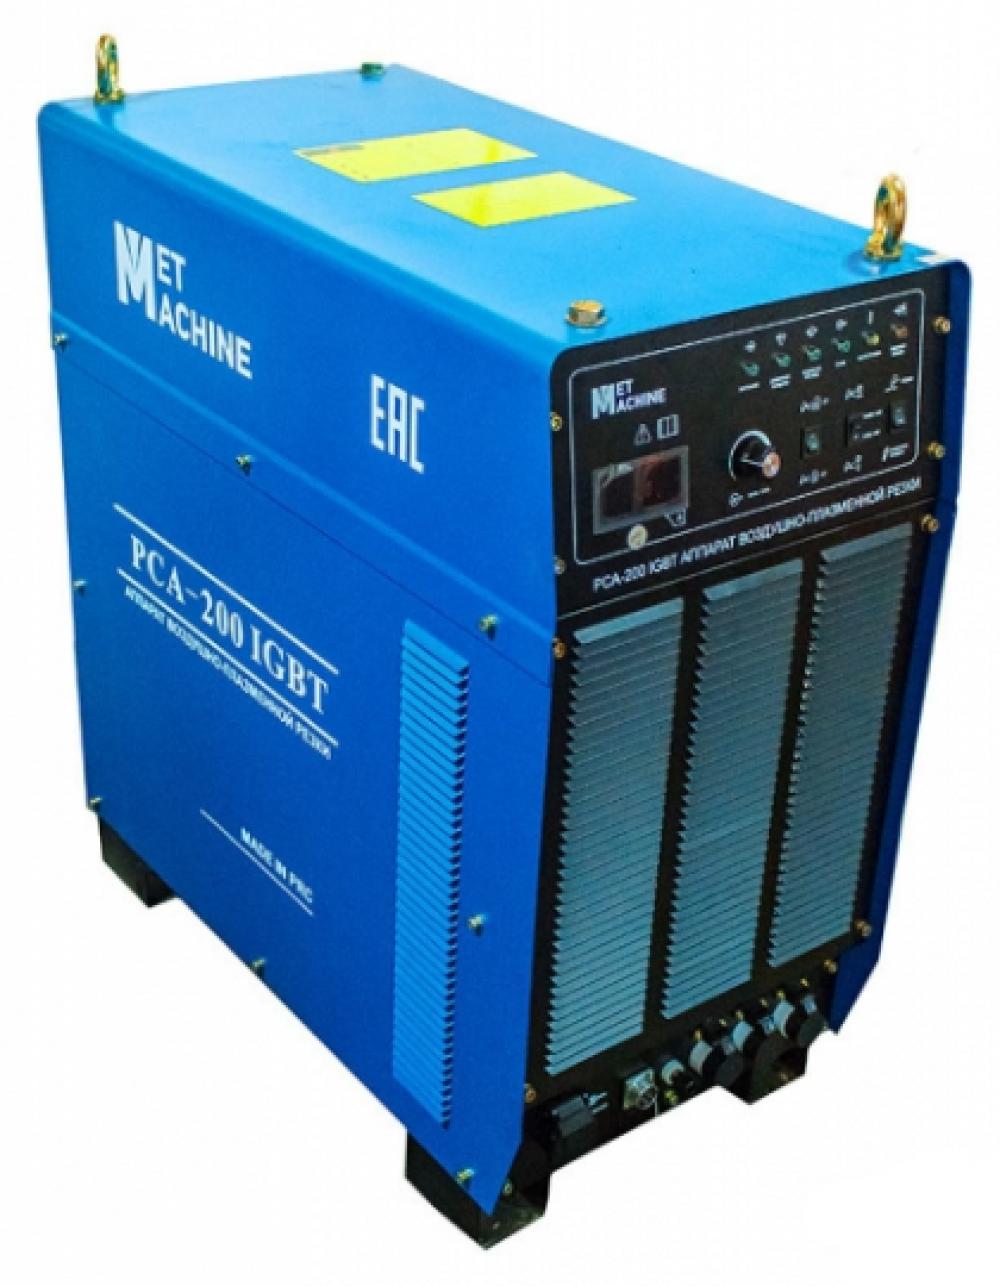 MetMachine PCA-200 IGBT